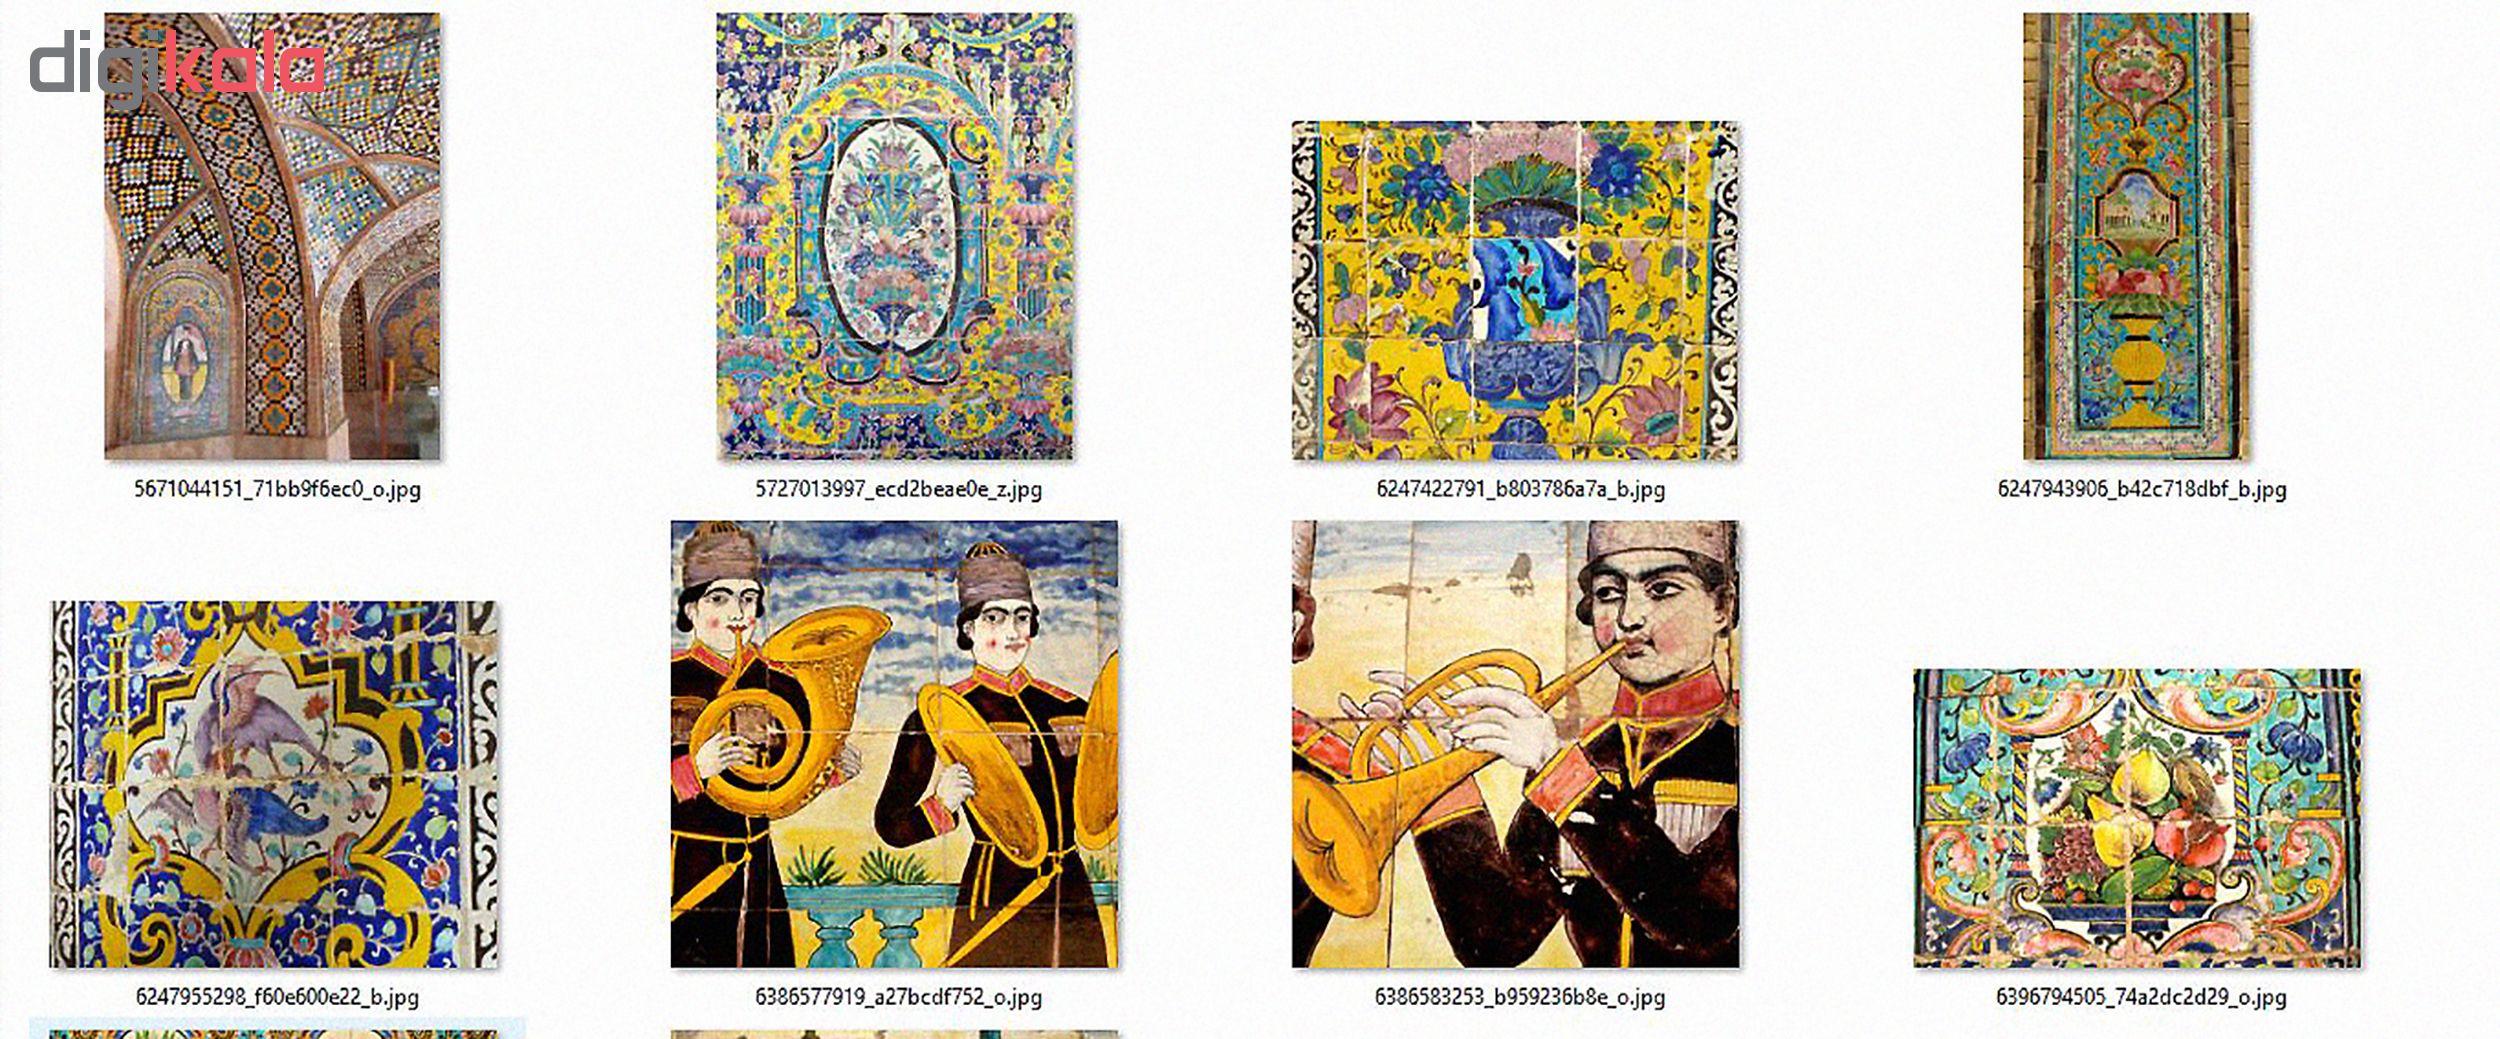 مجموعه کاشی کاری ایرانی- اسلامی